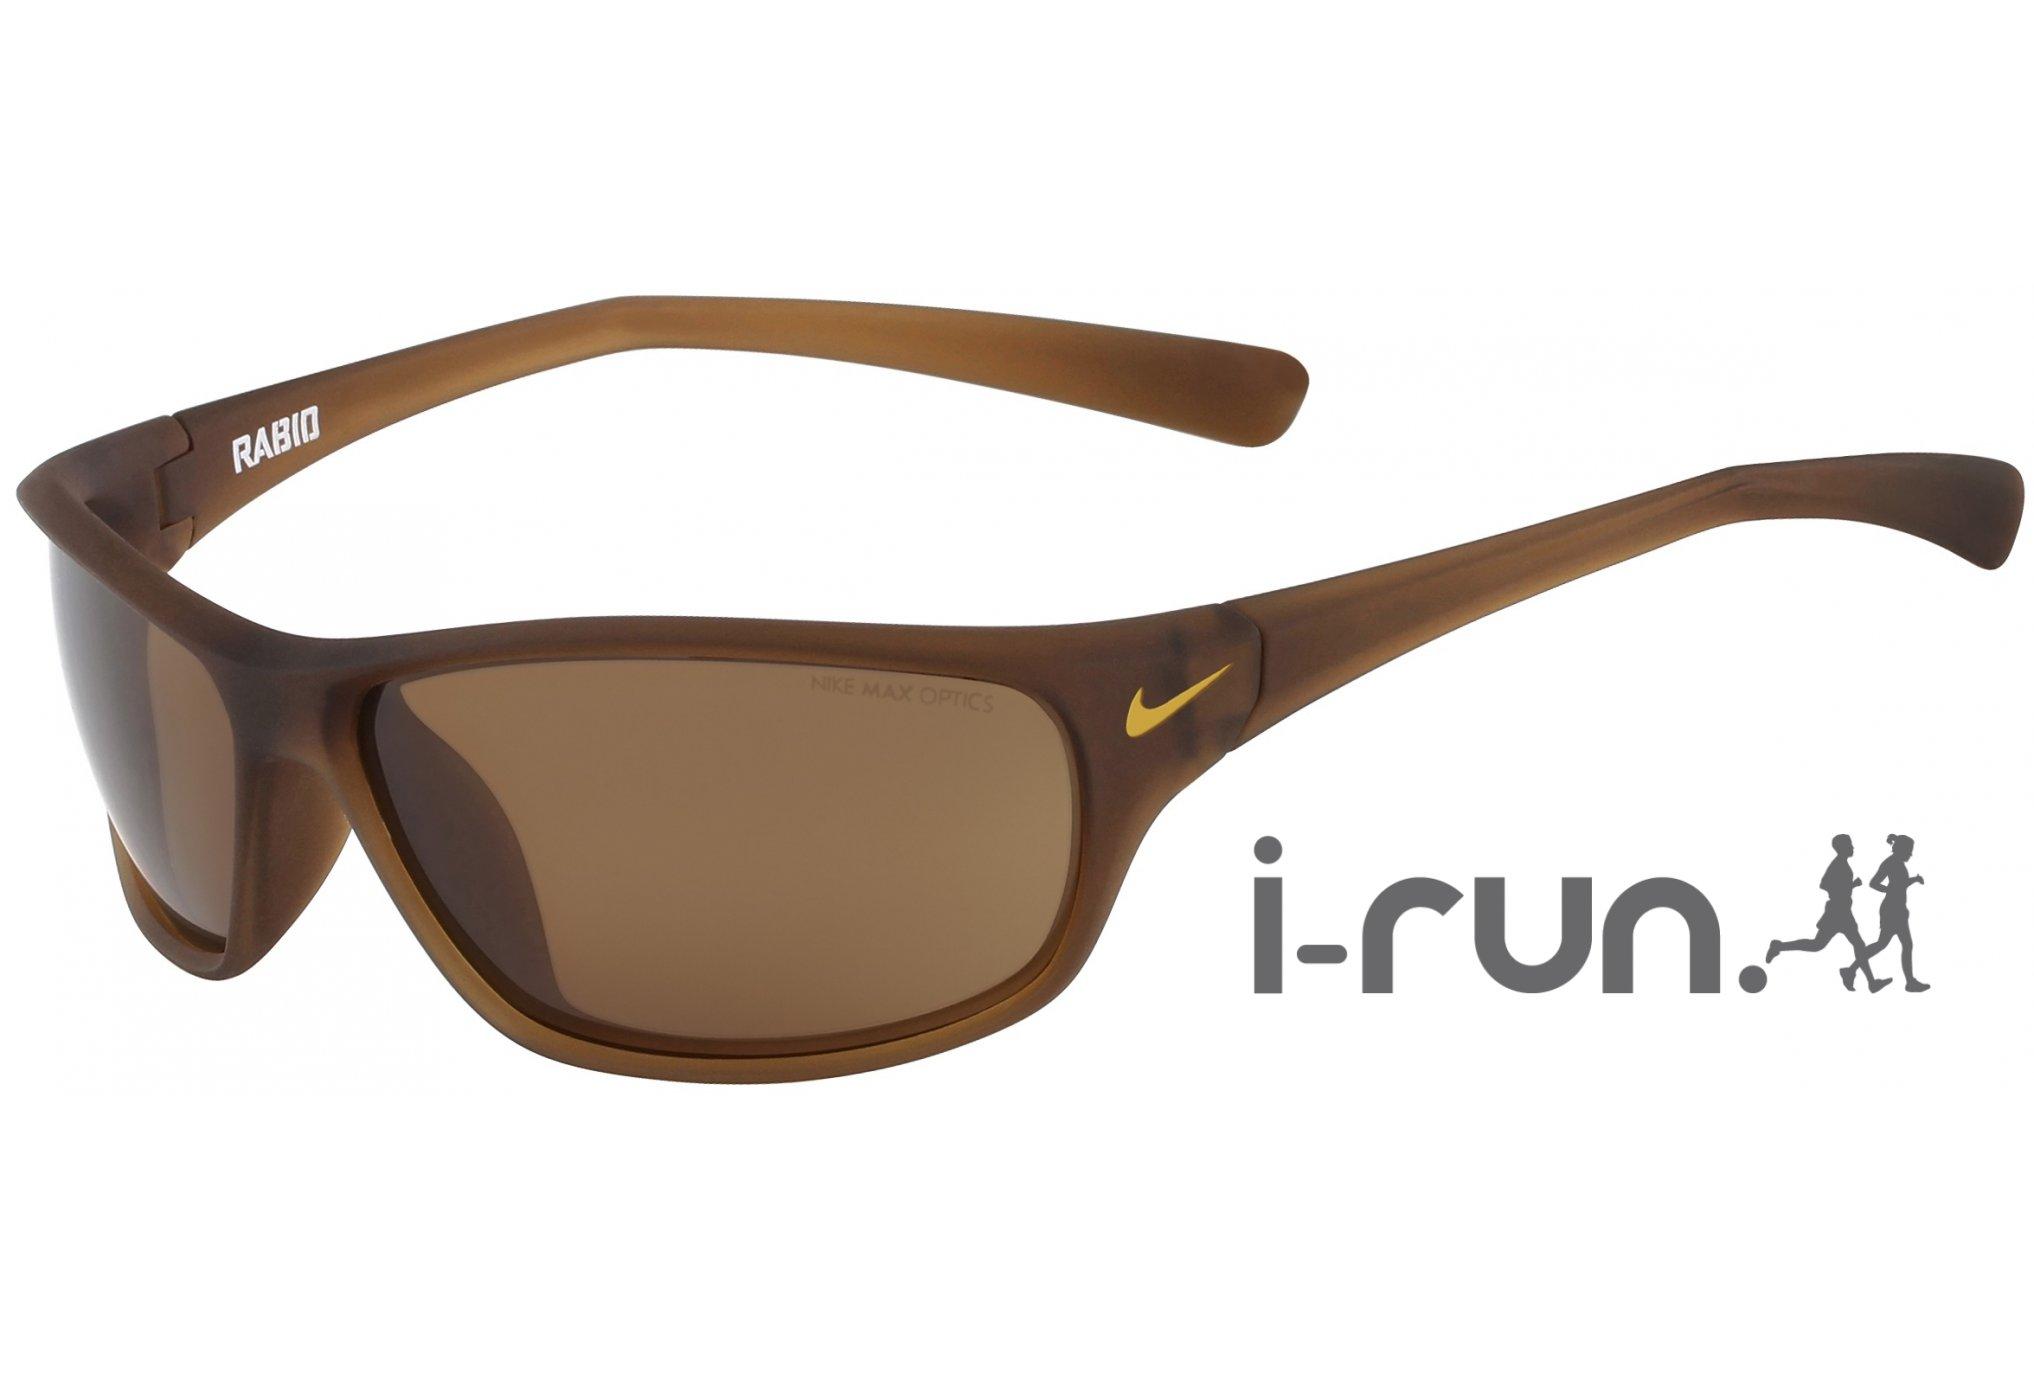 Nike Lunettes Rabid R Lunettes